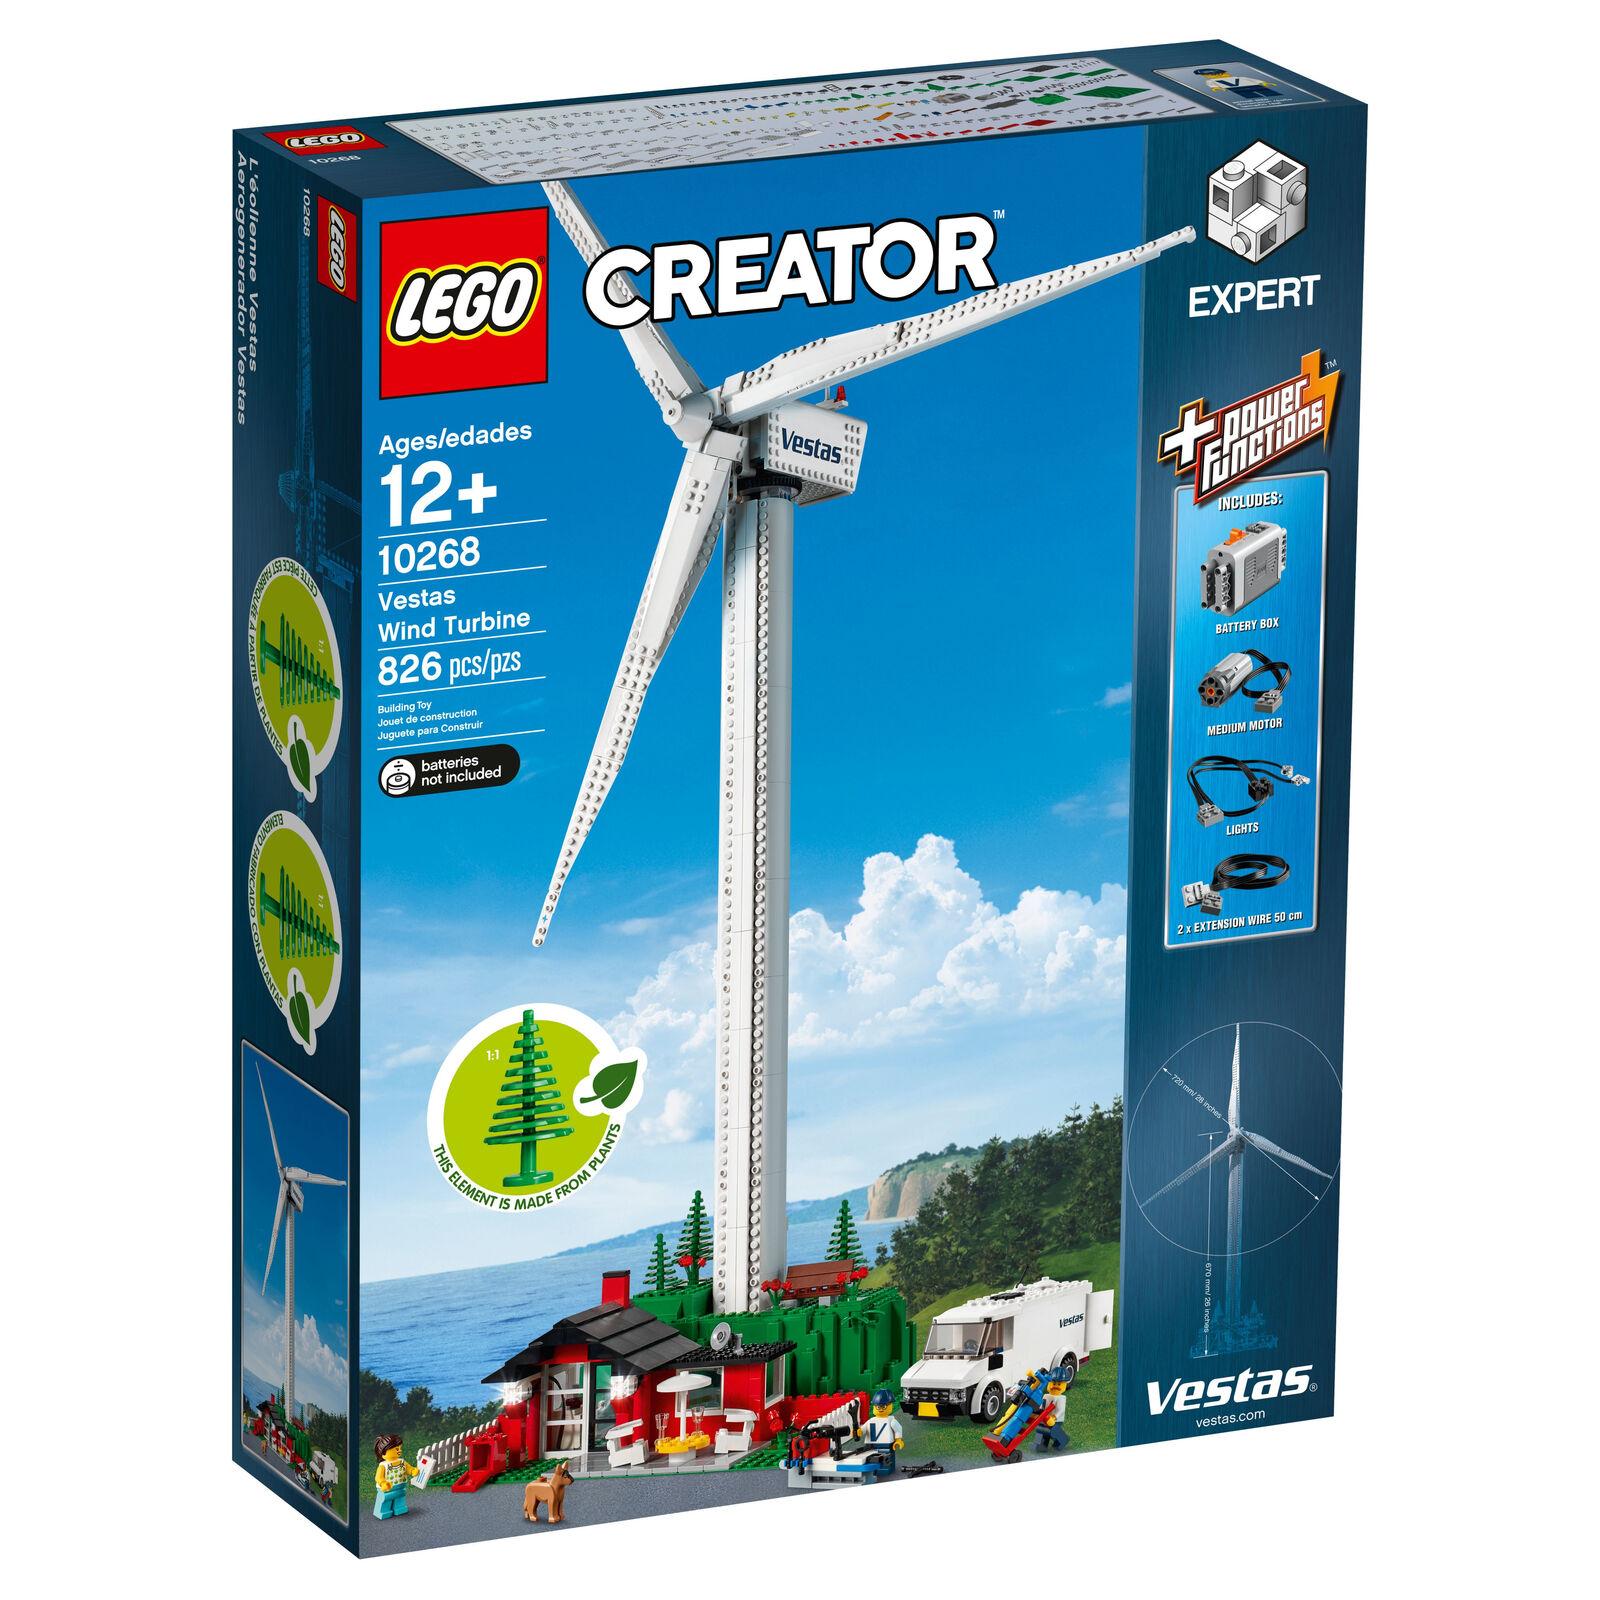 Lego Creator Vestas Wind Turbine Set 10268 H